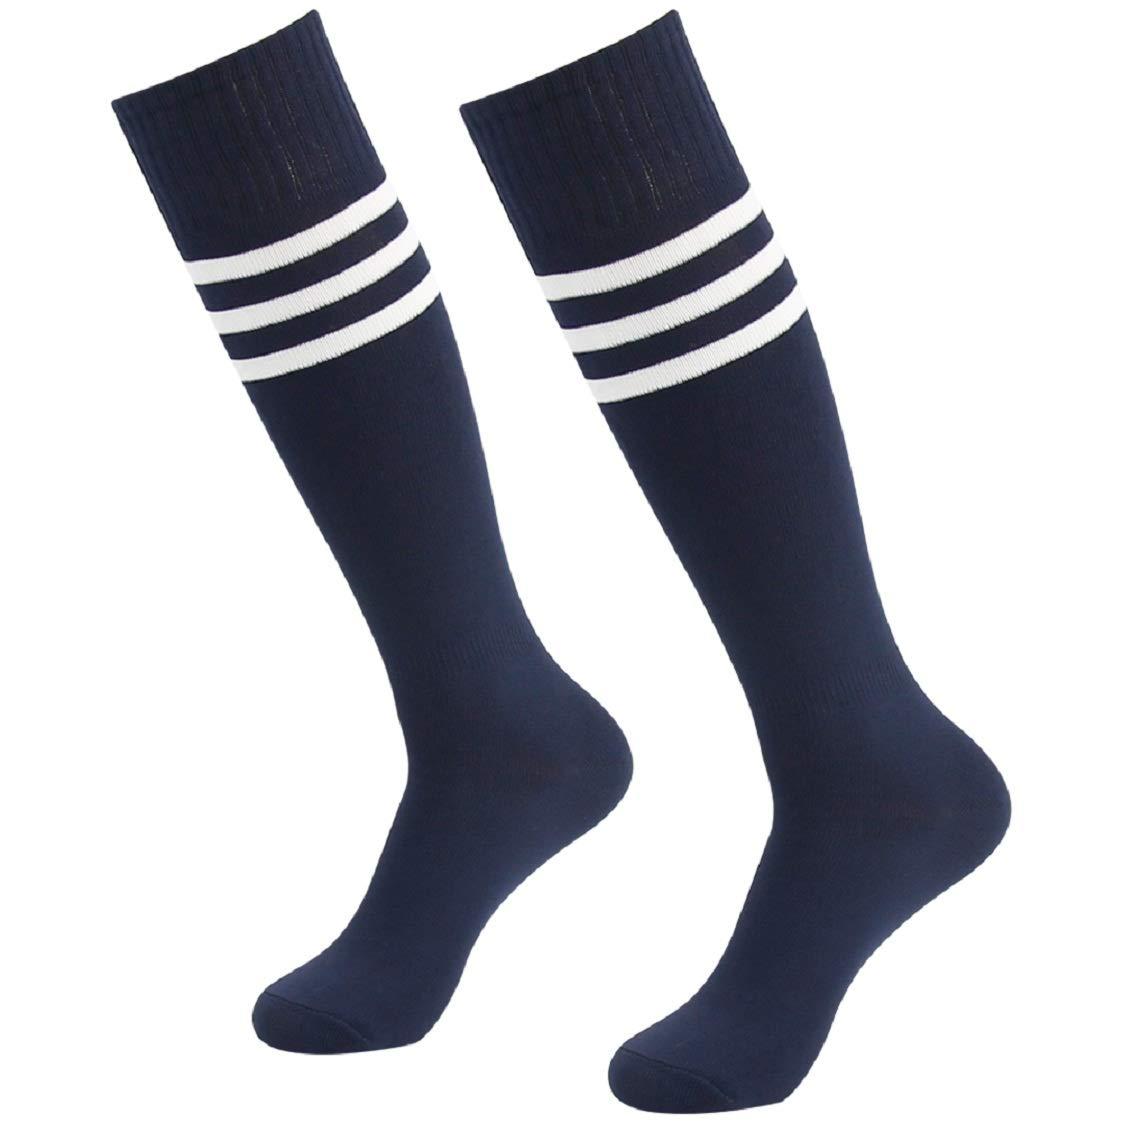 Navy Baseball Socks, 3street Unisex Sport Sweat-Absorbent Knee High Sport Athletic Football Soccer Tube Socks for School Game Navy 2-Pairs,7-13 by Three street